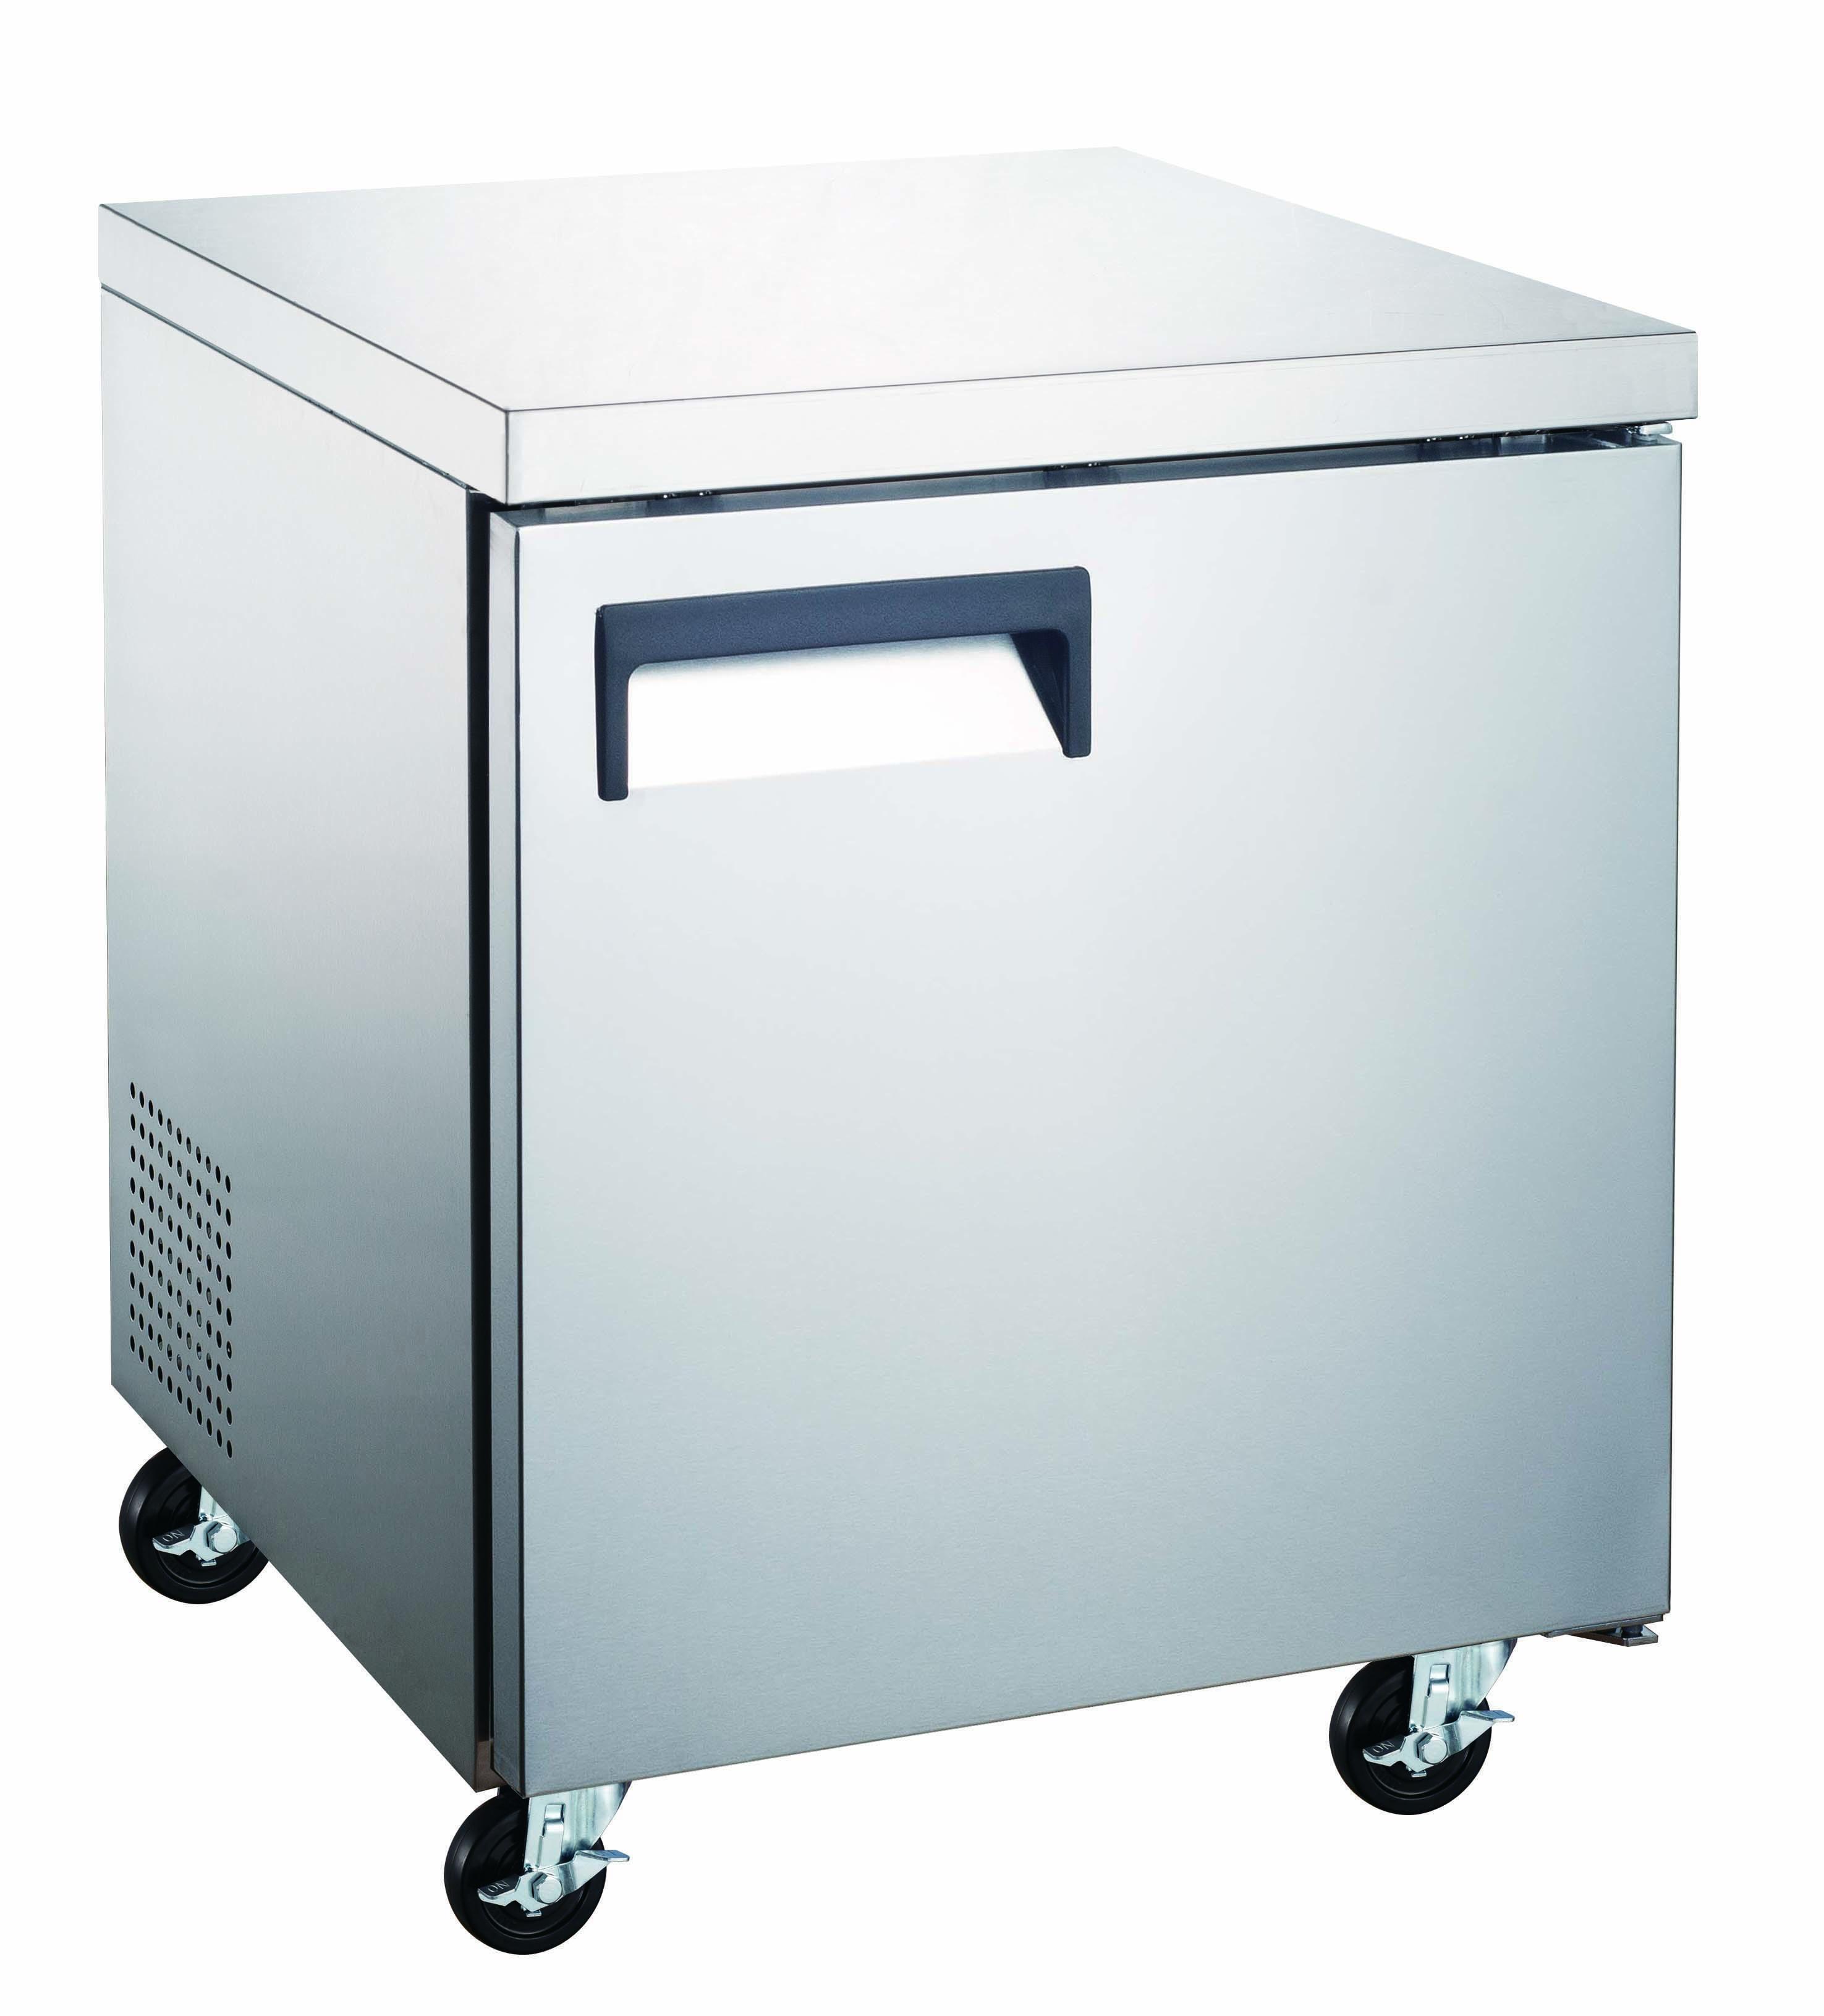 Admiral Craft GRUCFZ-48 undercounter freezer